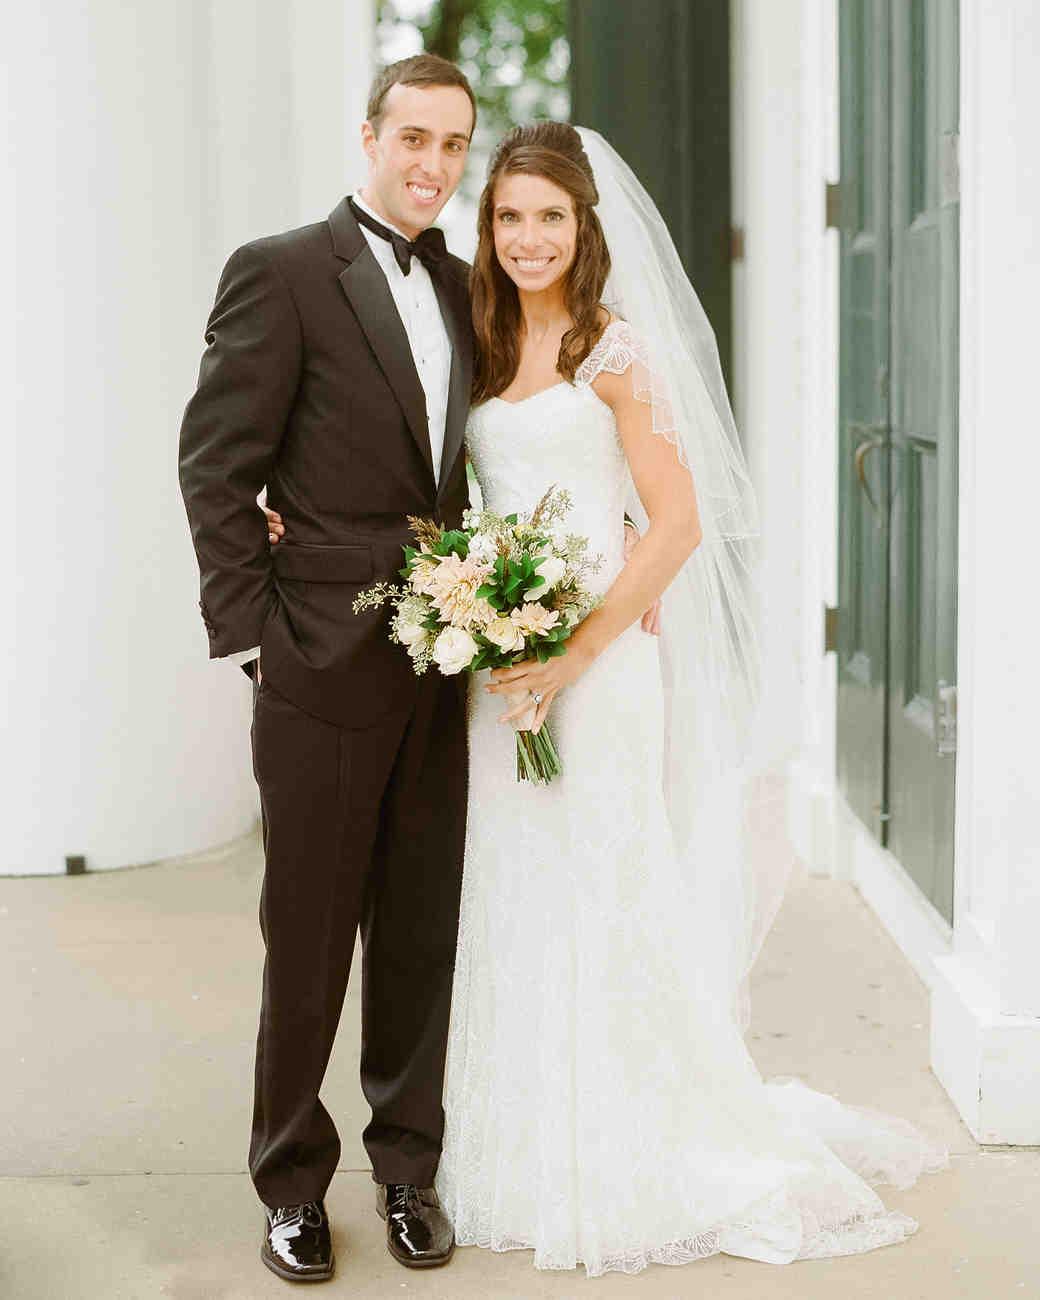 lindsay-garrett-wedding-couple-0597-s111850-0415.jpg